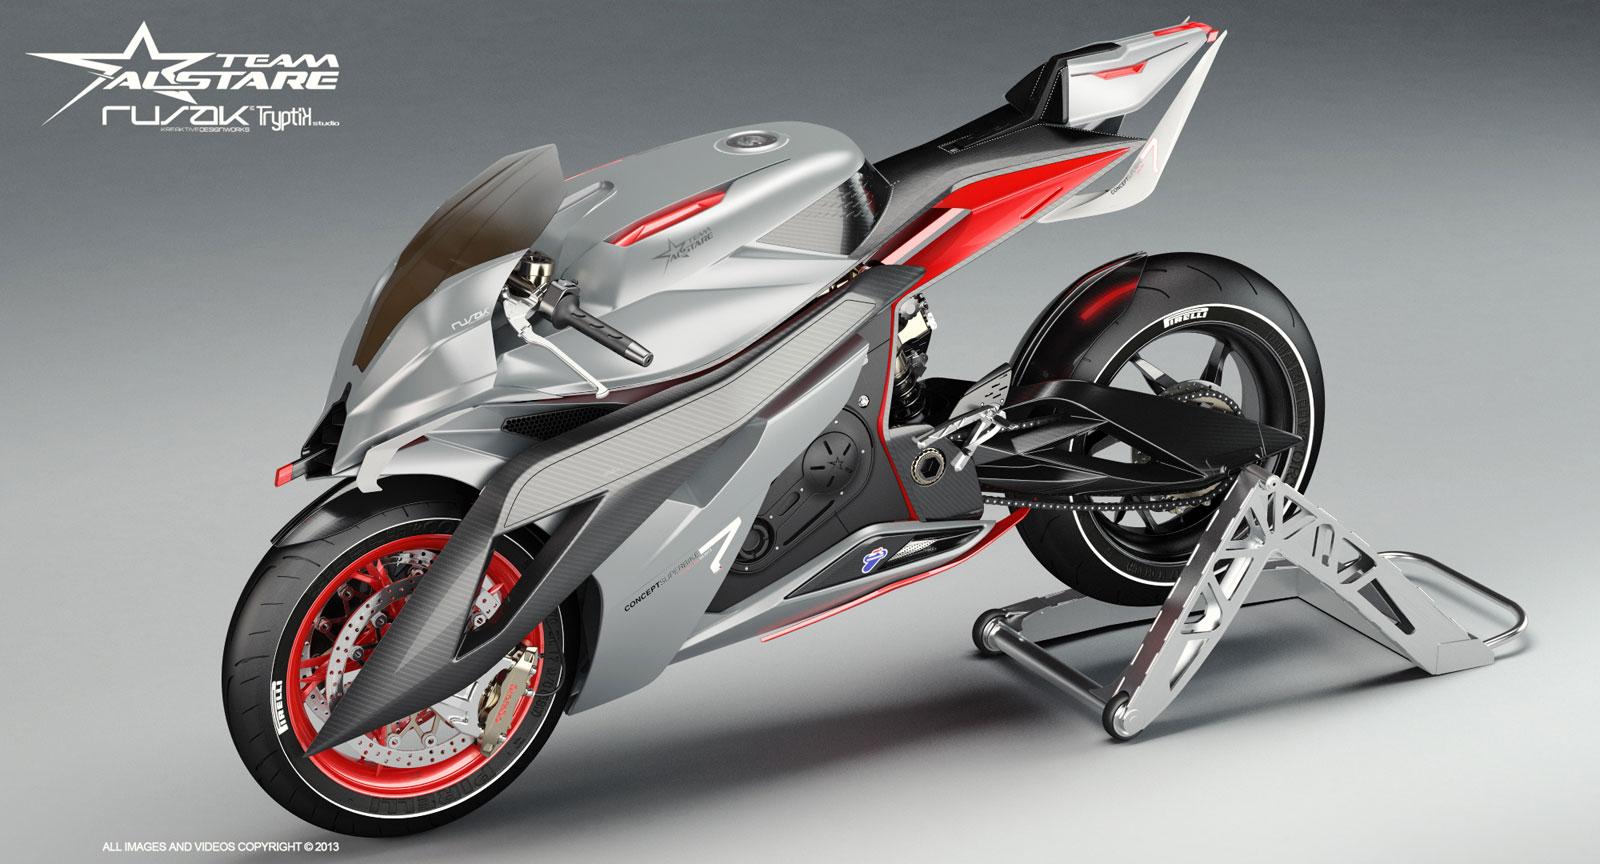 http://www.diseno-art.com/news_content/wp-content/uploads/2013/06/Alstare-Concept-Superbike-3.jpg